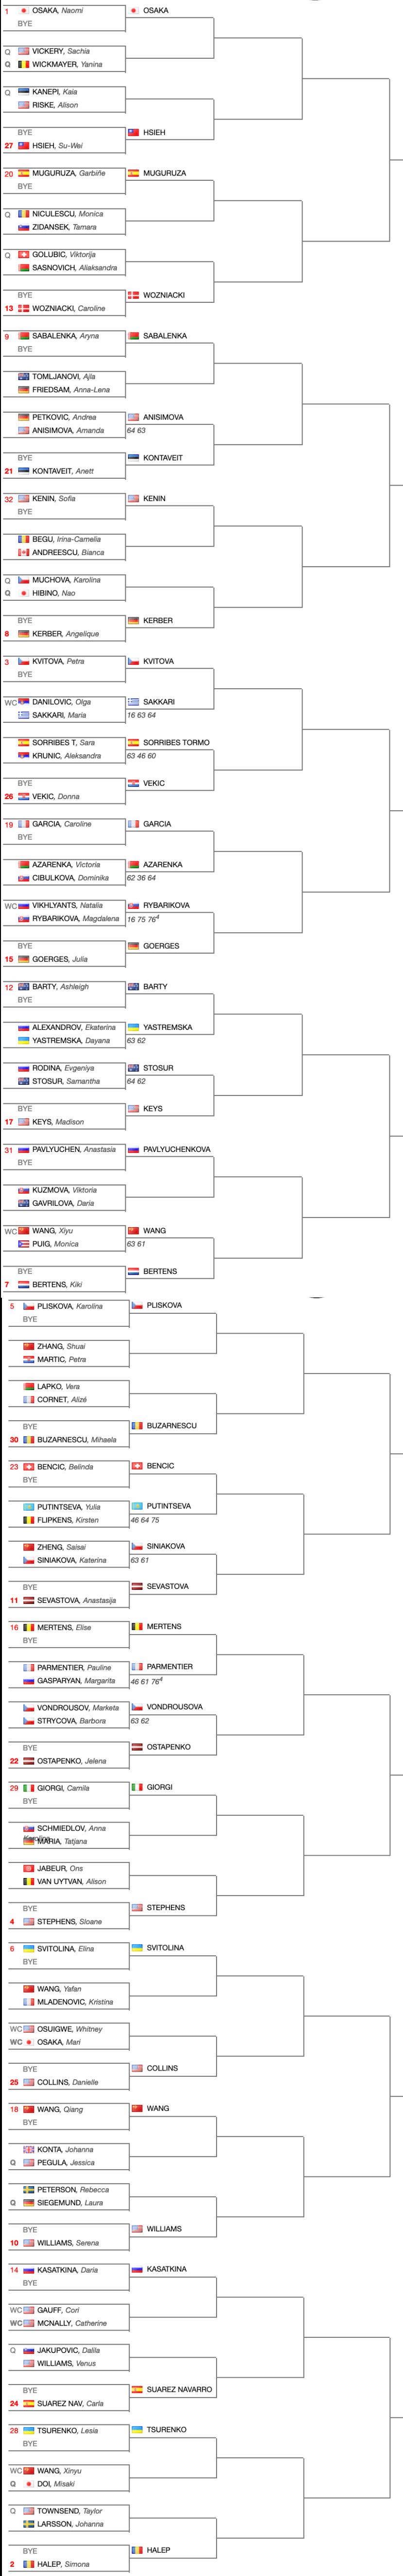 Calendario Tornei Atp 2020.Miami Open 2019 Masters 1000 E Premier Mandatory